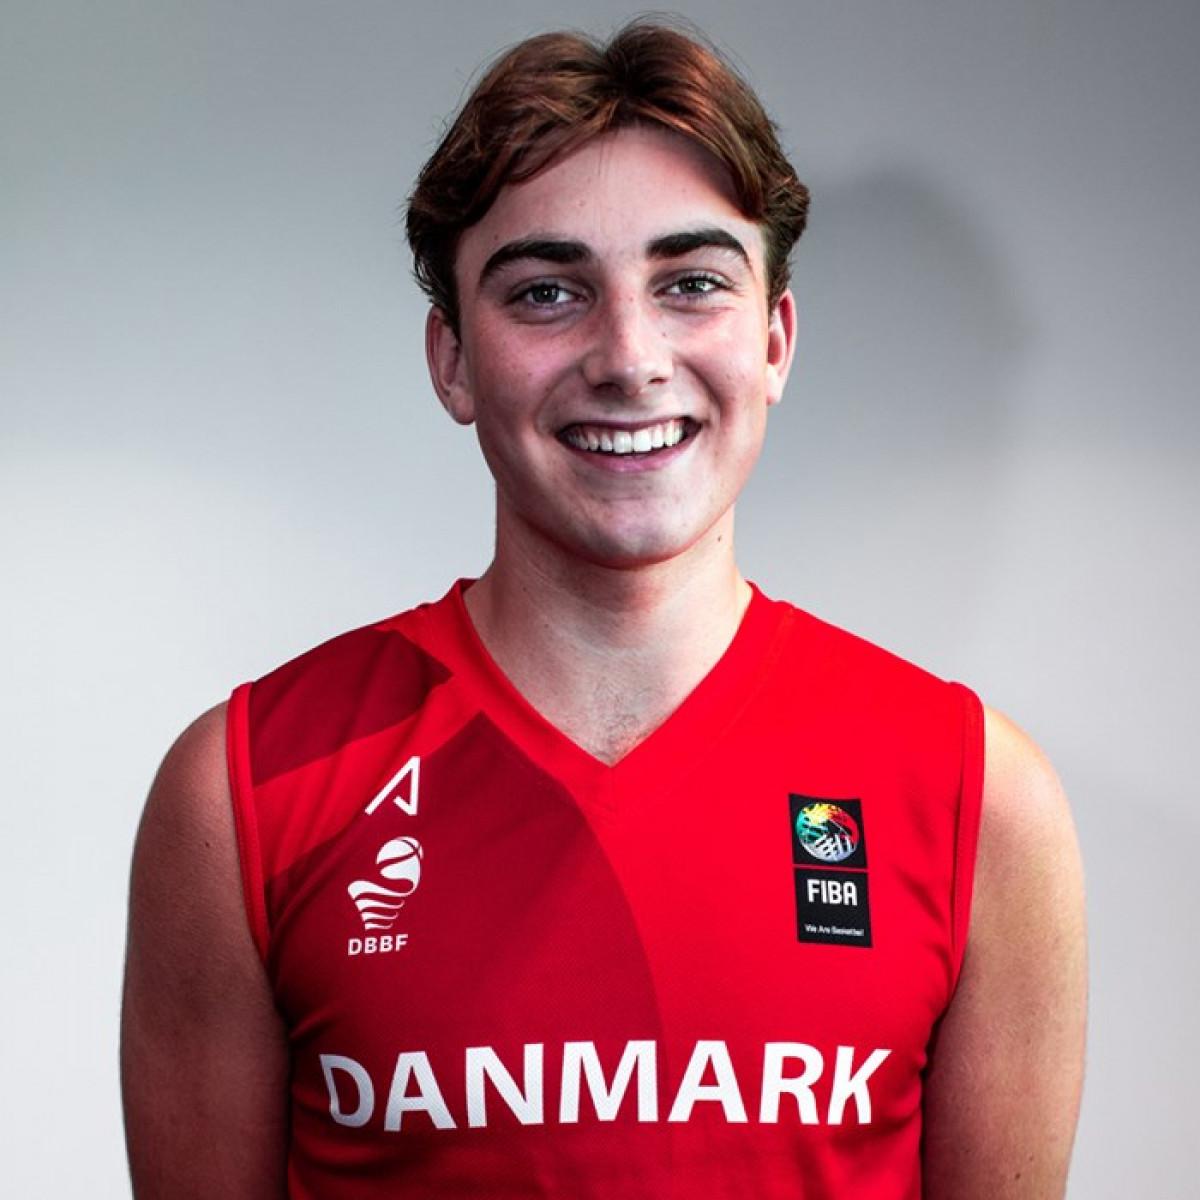 Photo of Noah Sorensen, 2019-2020 season